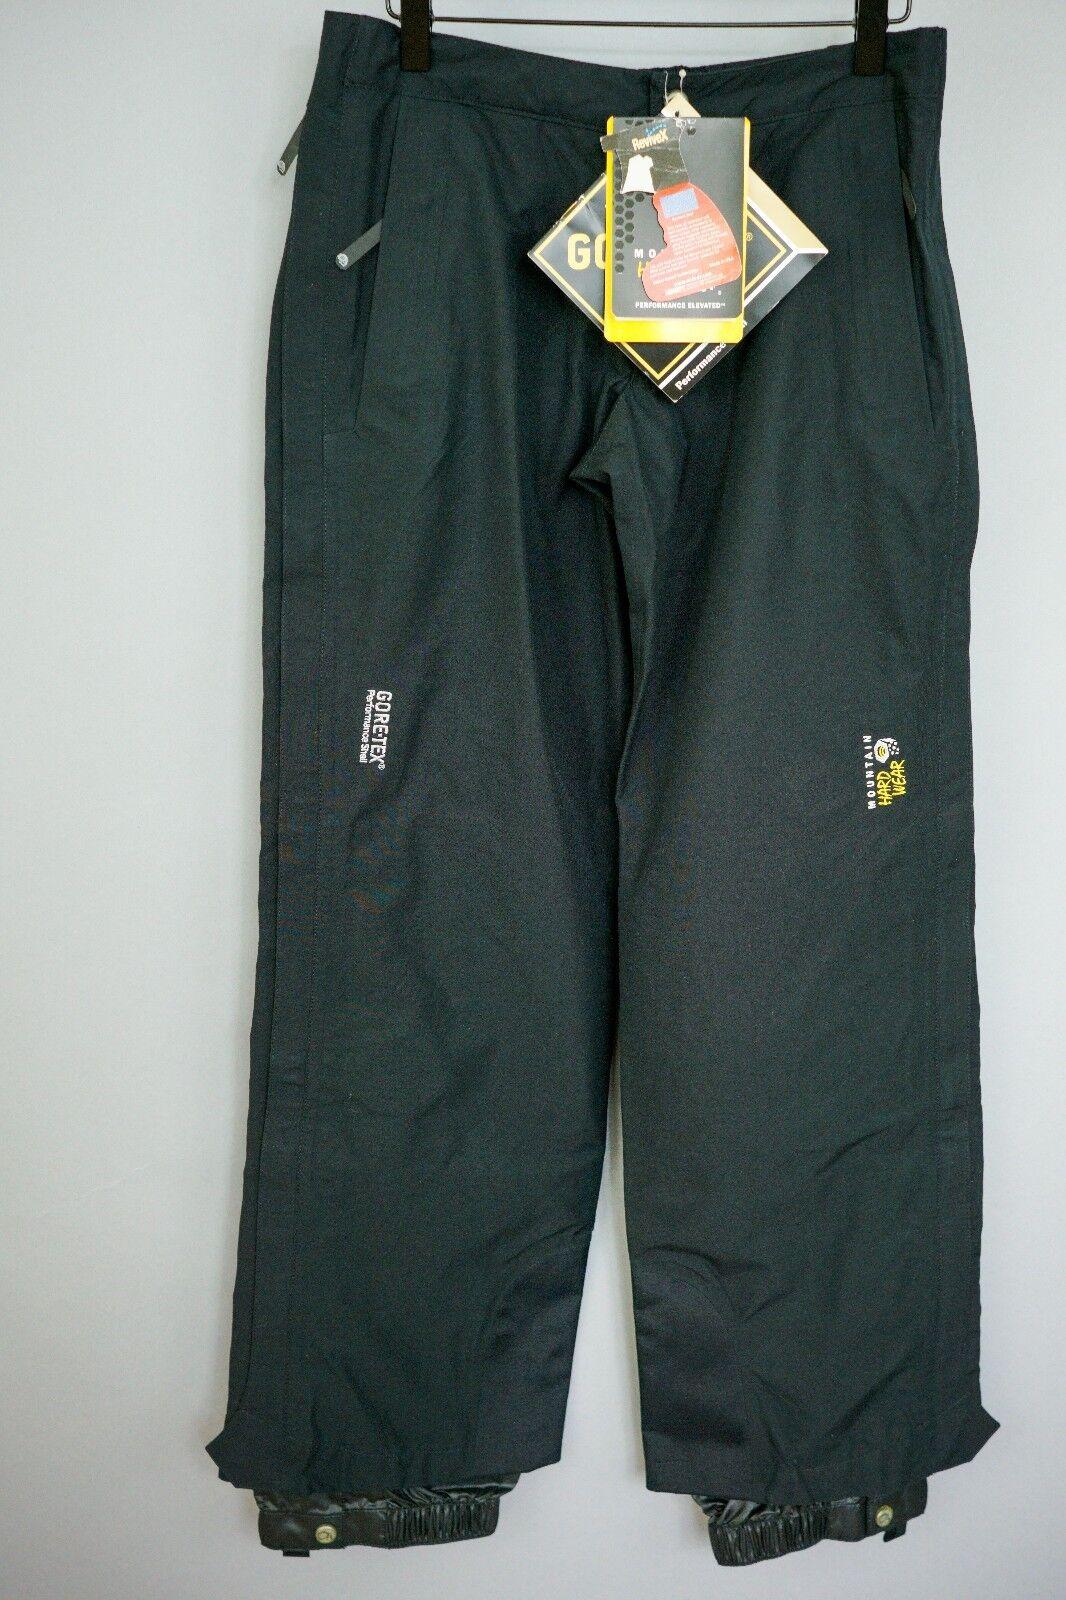 XII401 Mujer Mountain Hardwear Gore-Tex Esquí Snowboard PANTALONES S W30 L30